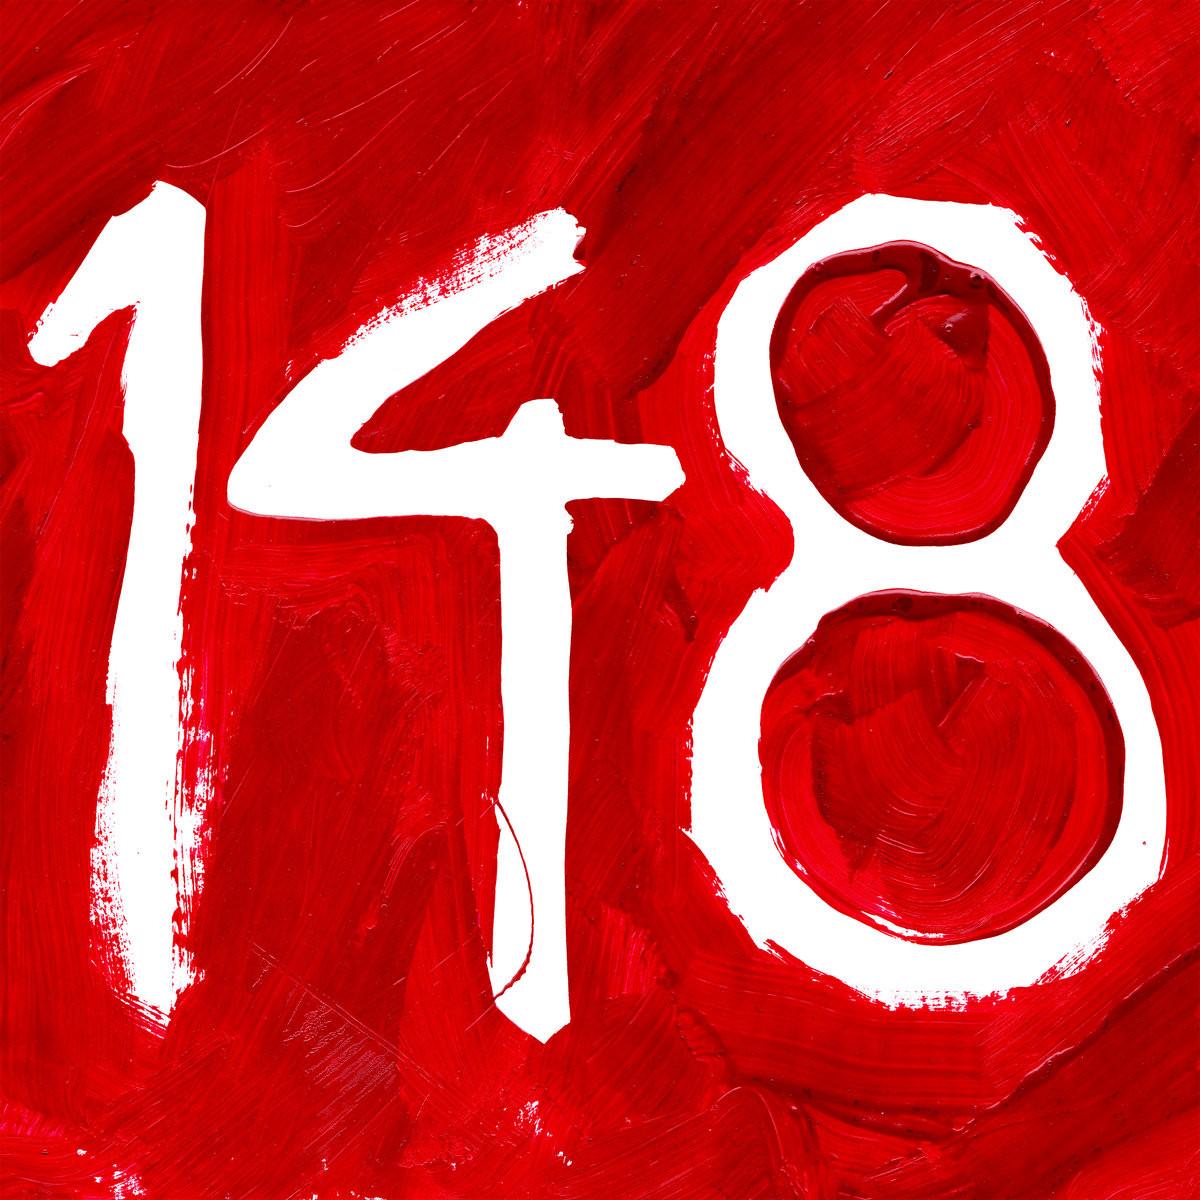 148 – C418